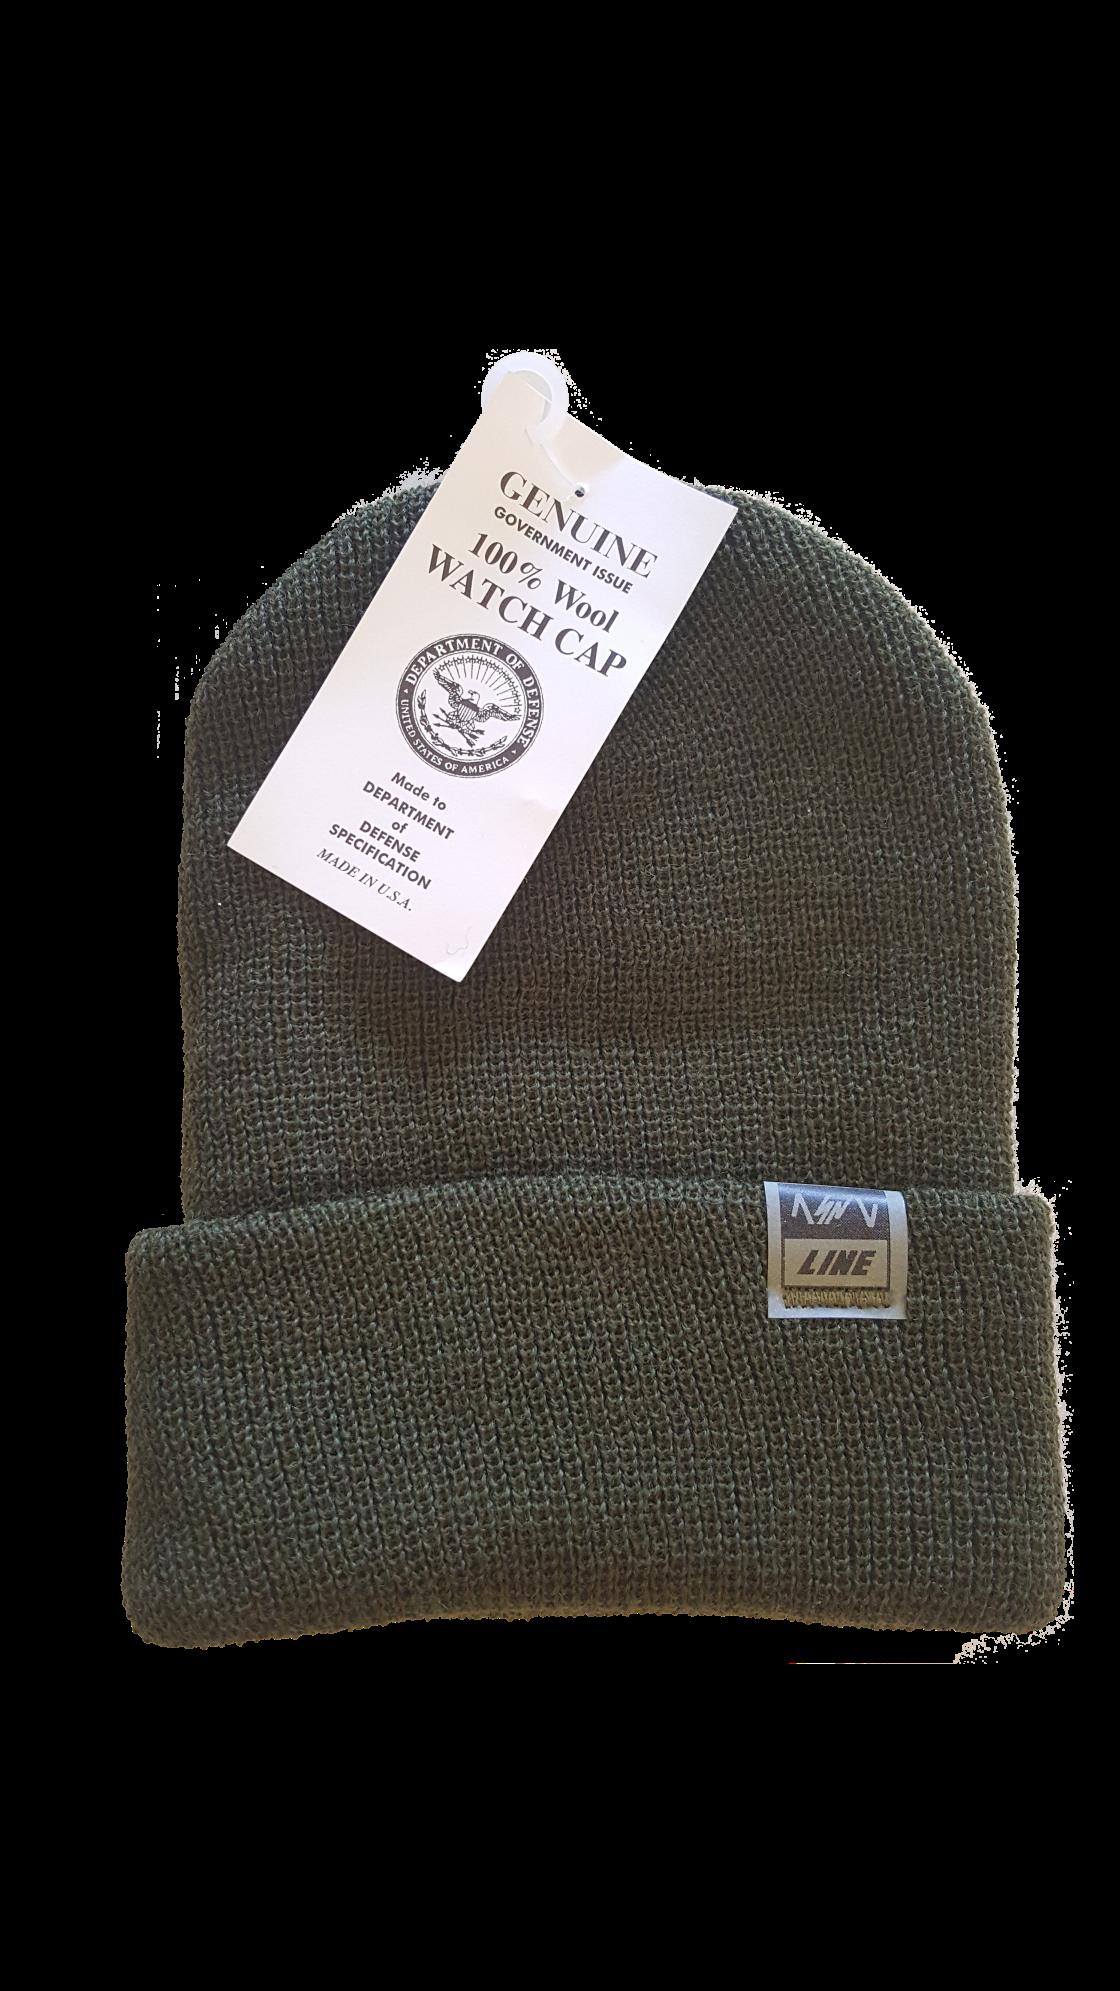 60659d84 ASNL LINE Genuine G.I. Wool Watch Cap – All Skill No Luck ...